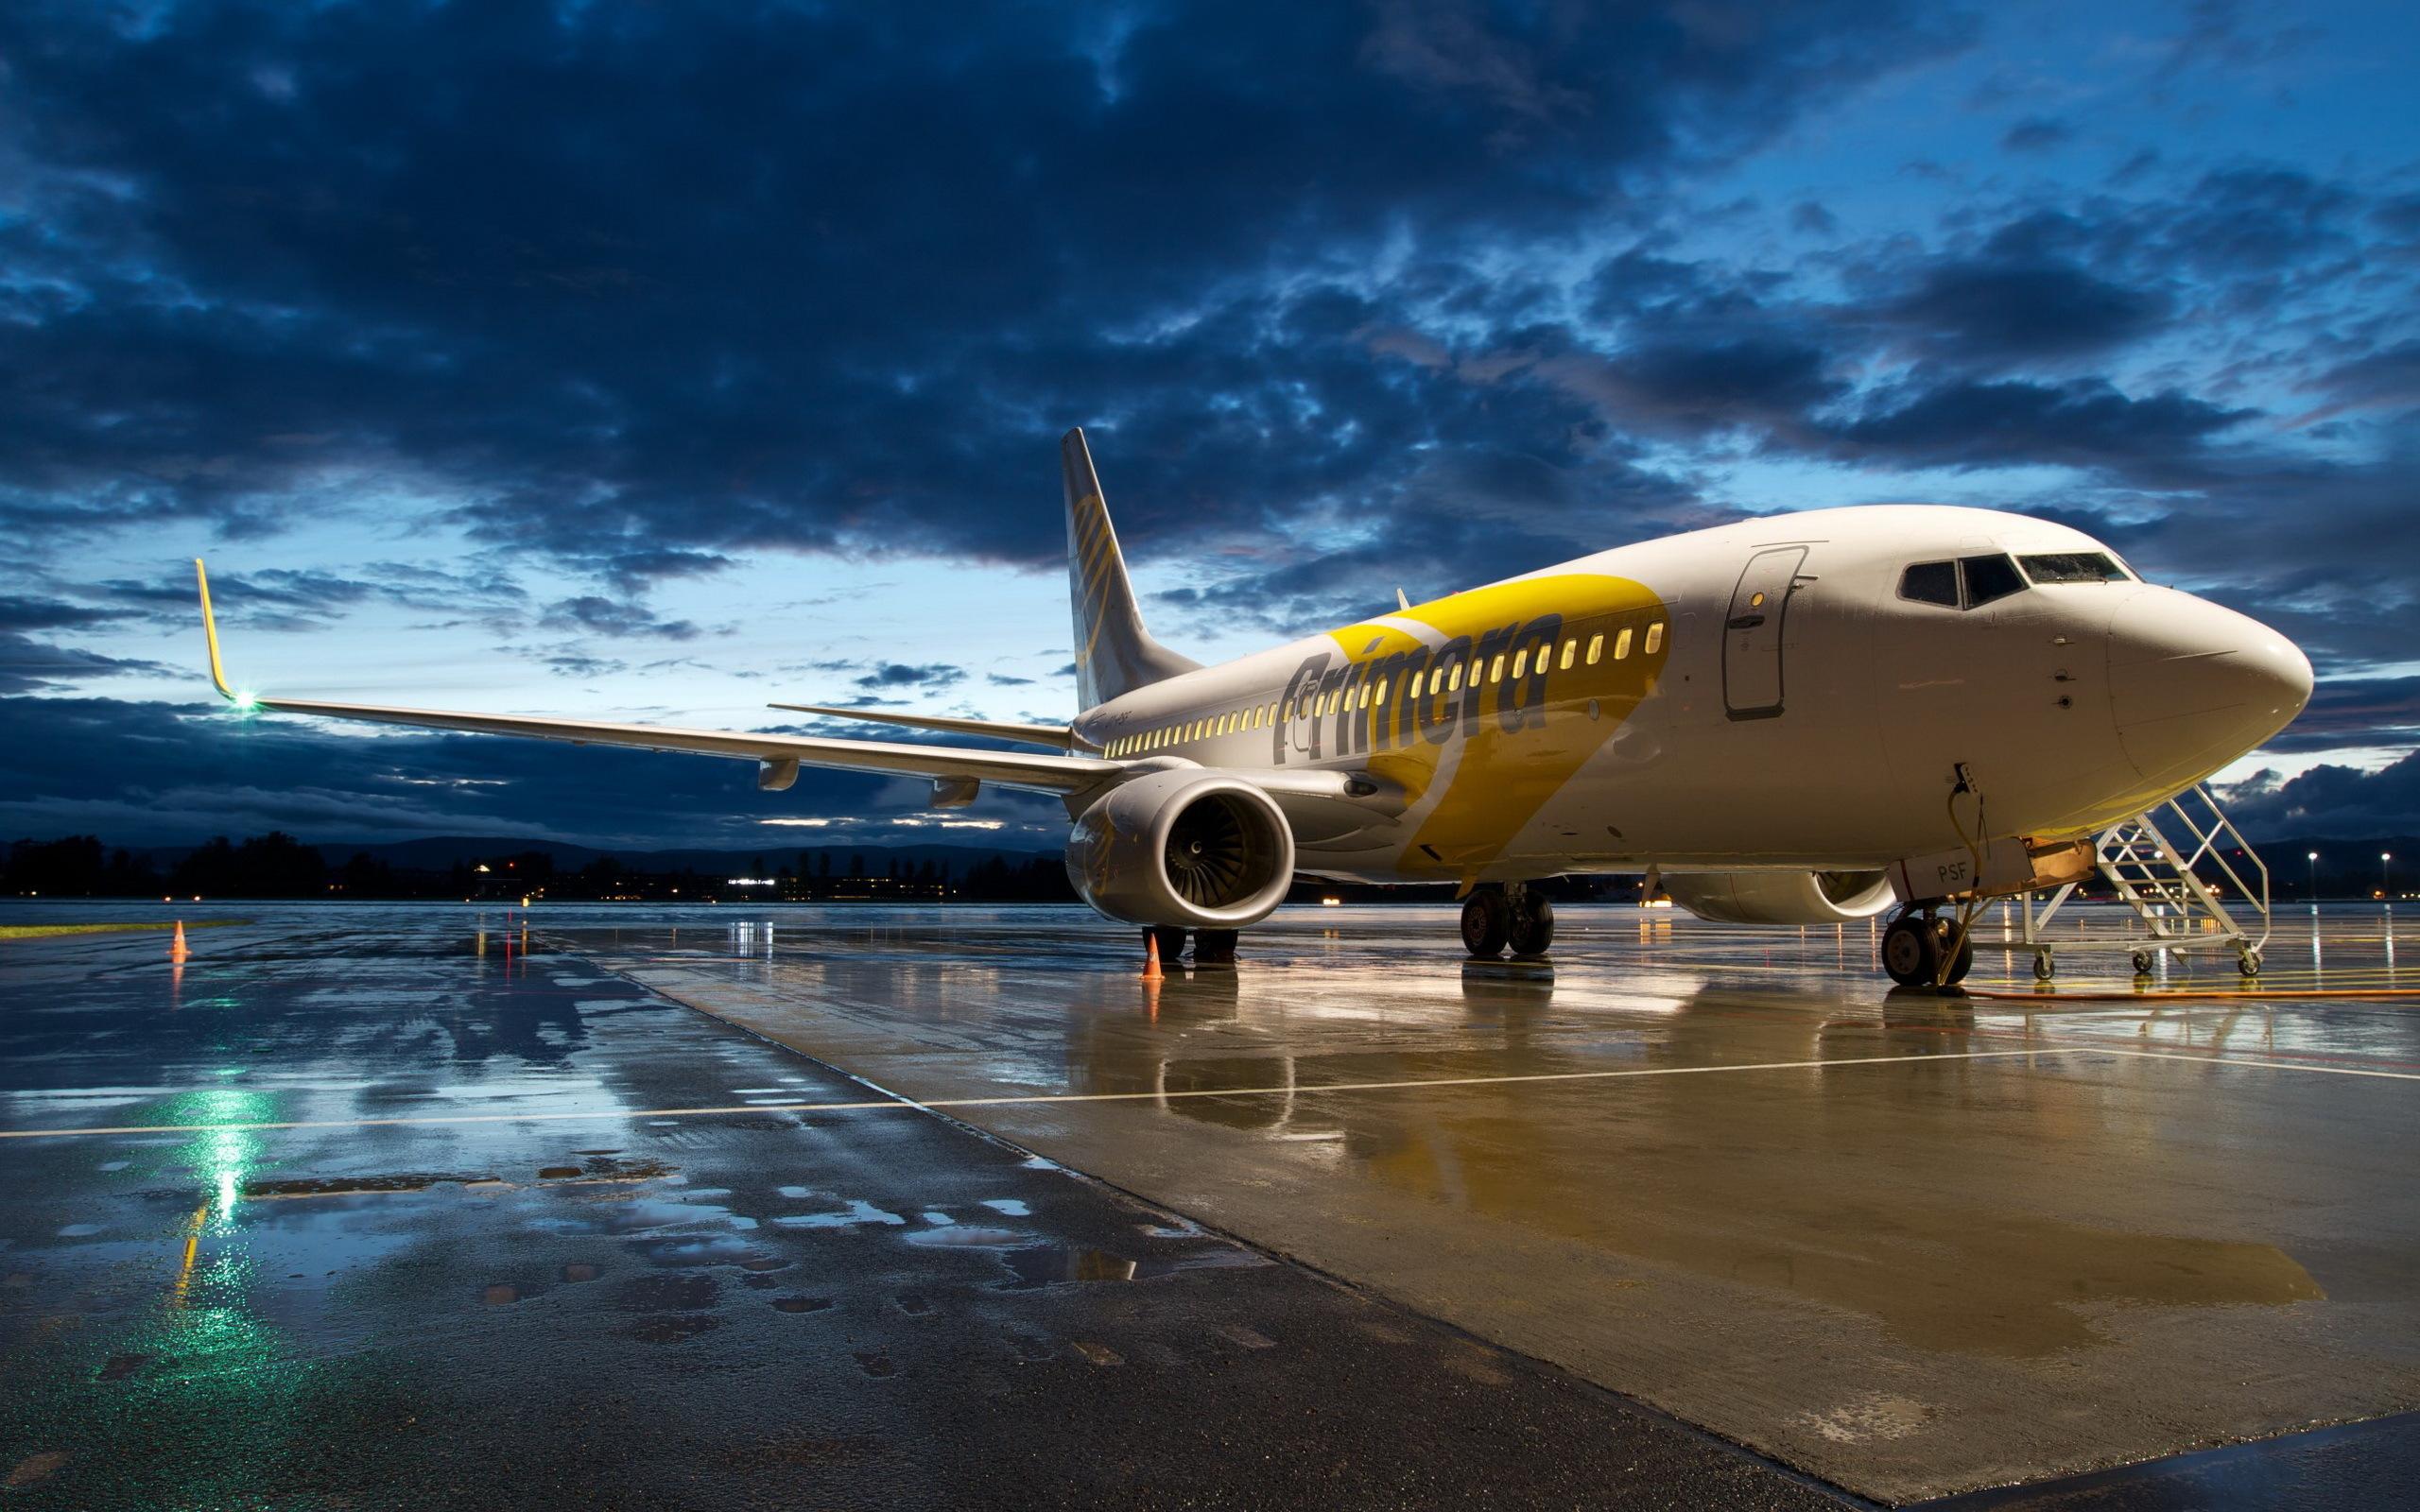 HDoboi.Kiev.ua - Самолет Боинг 737 припаркованный в аэропорту, гражданская авиация